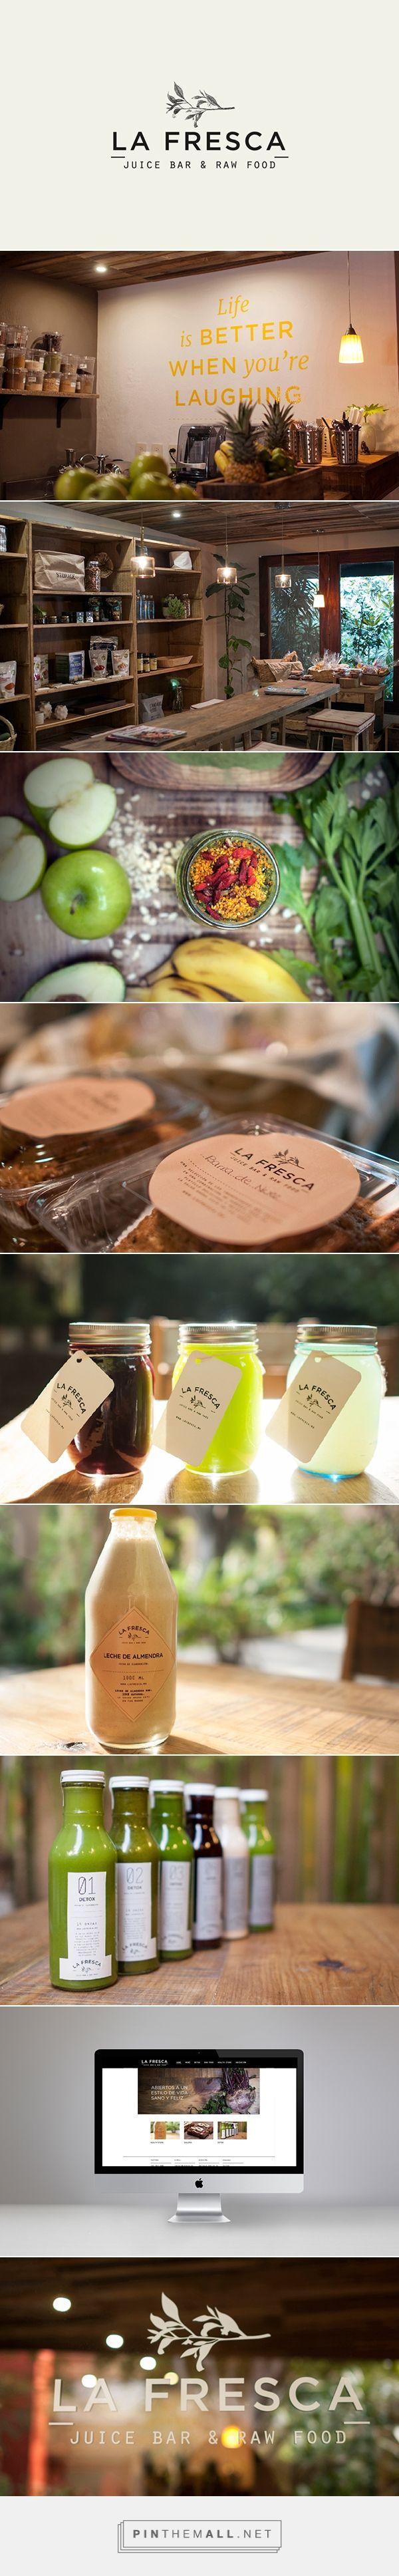 La Fresca Branding on Behance | Fivestar Branding – Design and Branding Agency & Inspiration Gallery | Professional Logo and Website Design